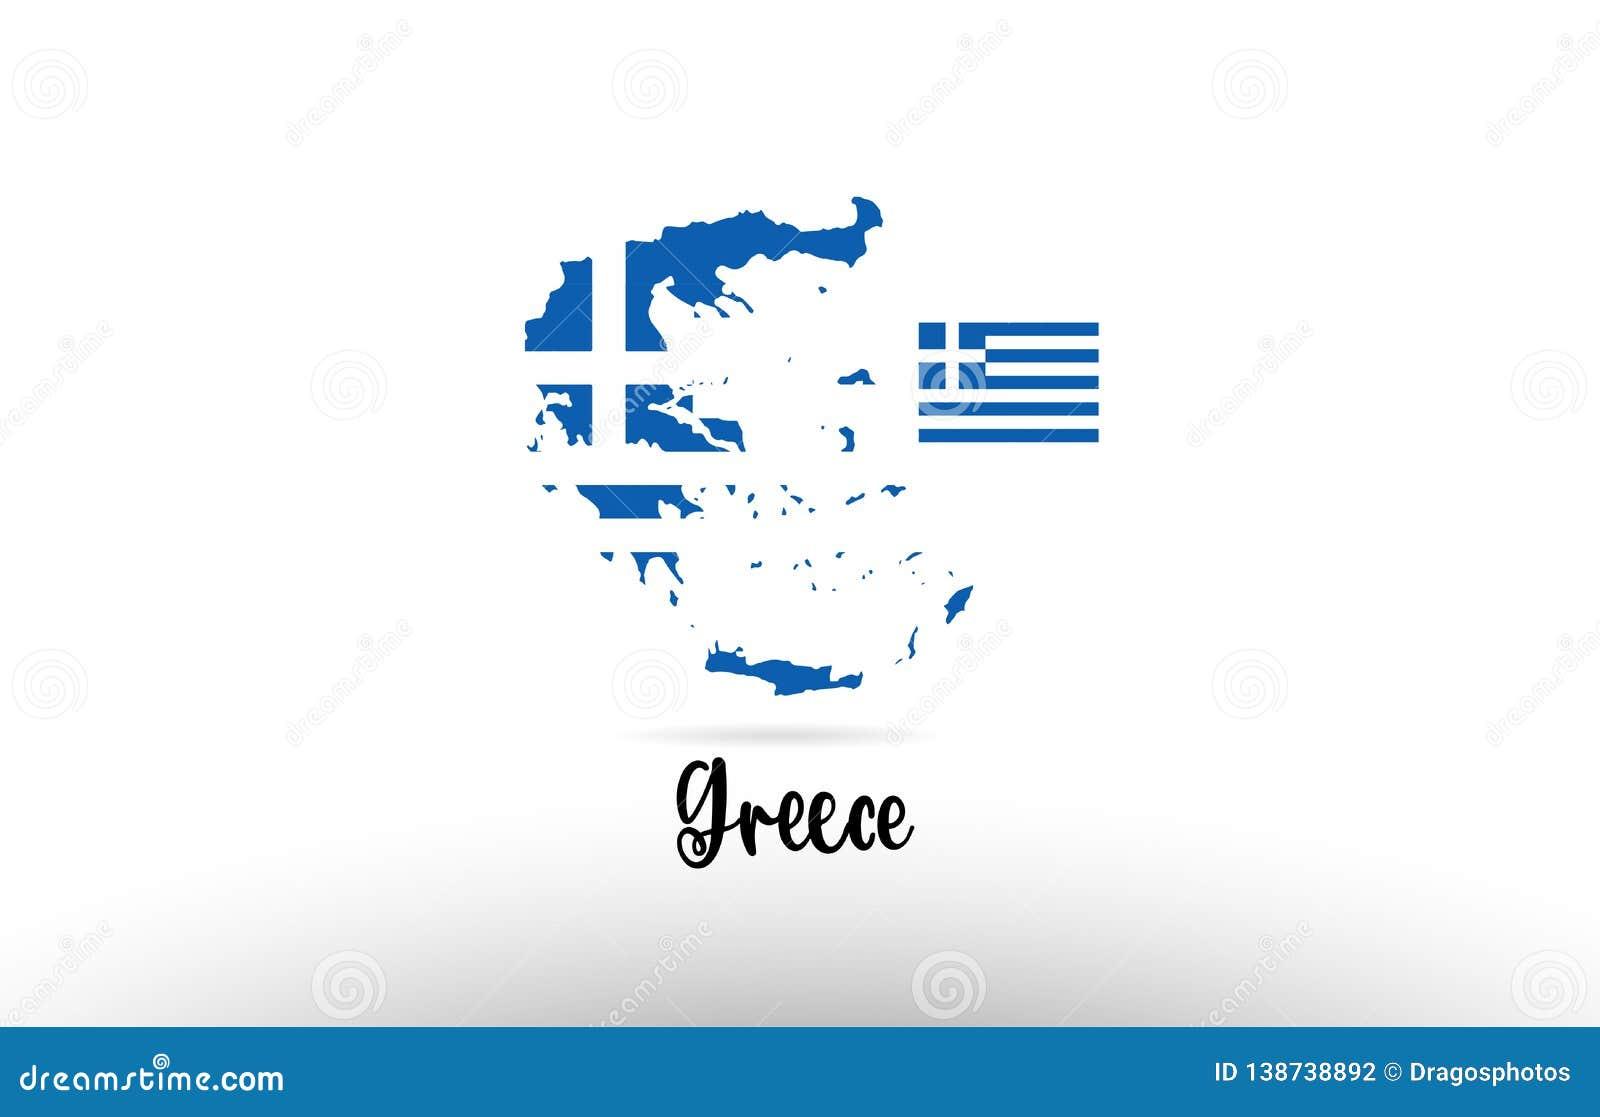 Grecja kraju flaga wśrodku mapa konturu projekta ikony logo